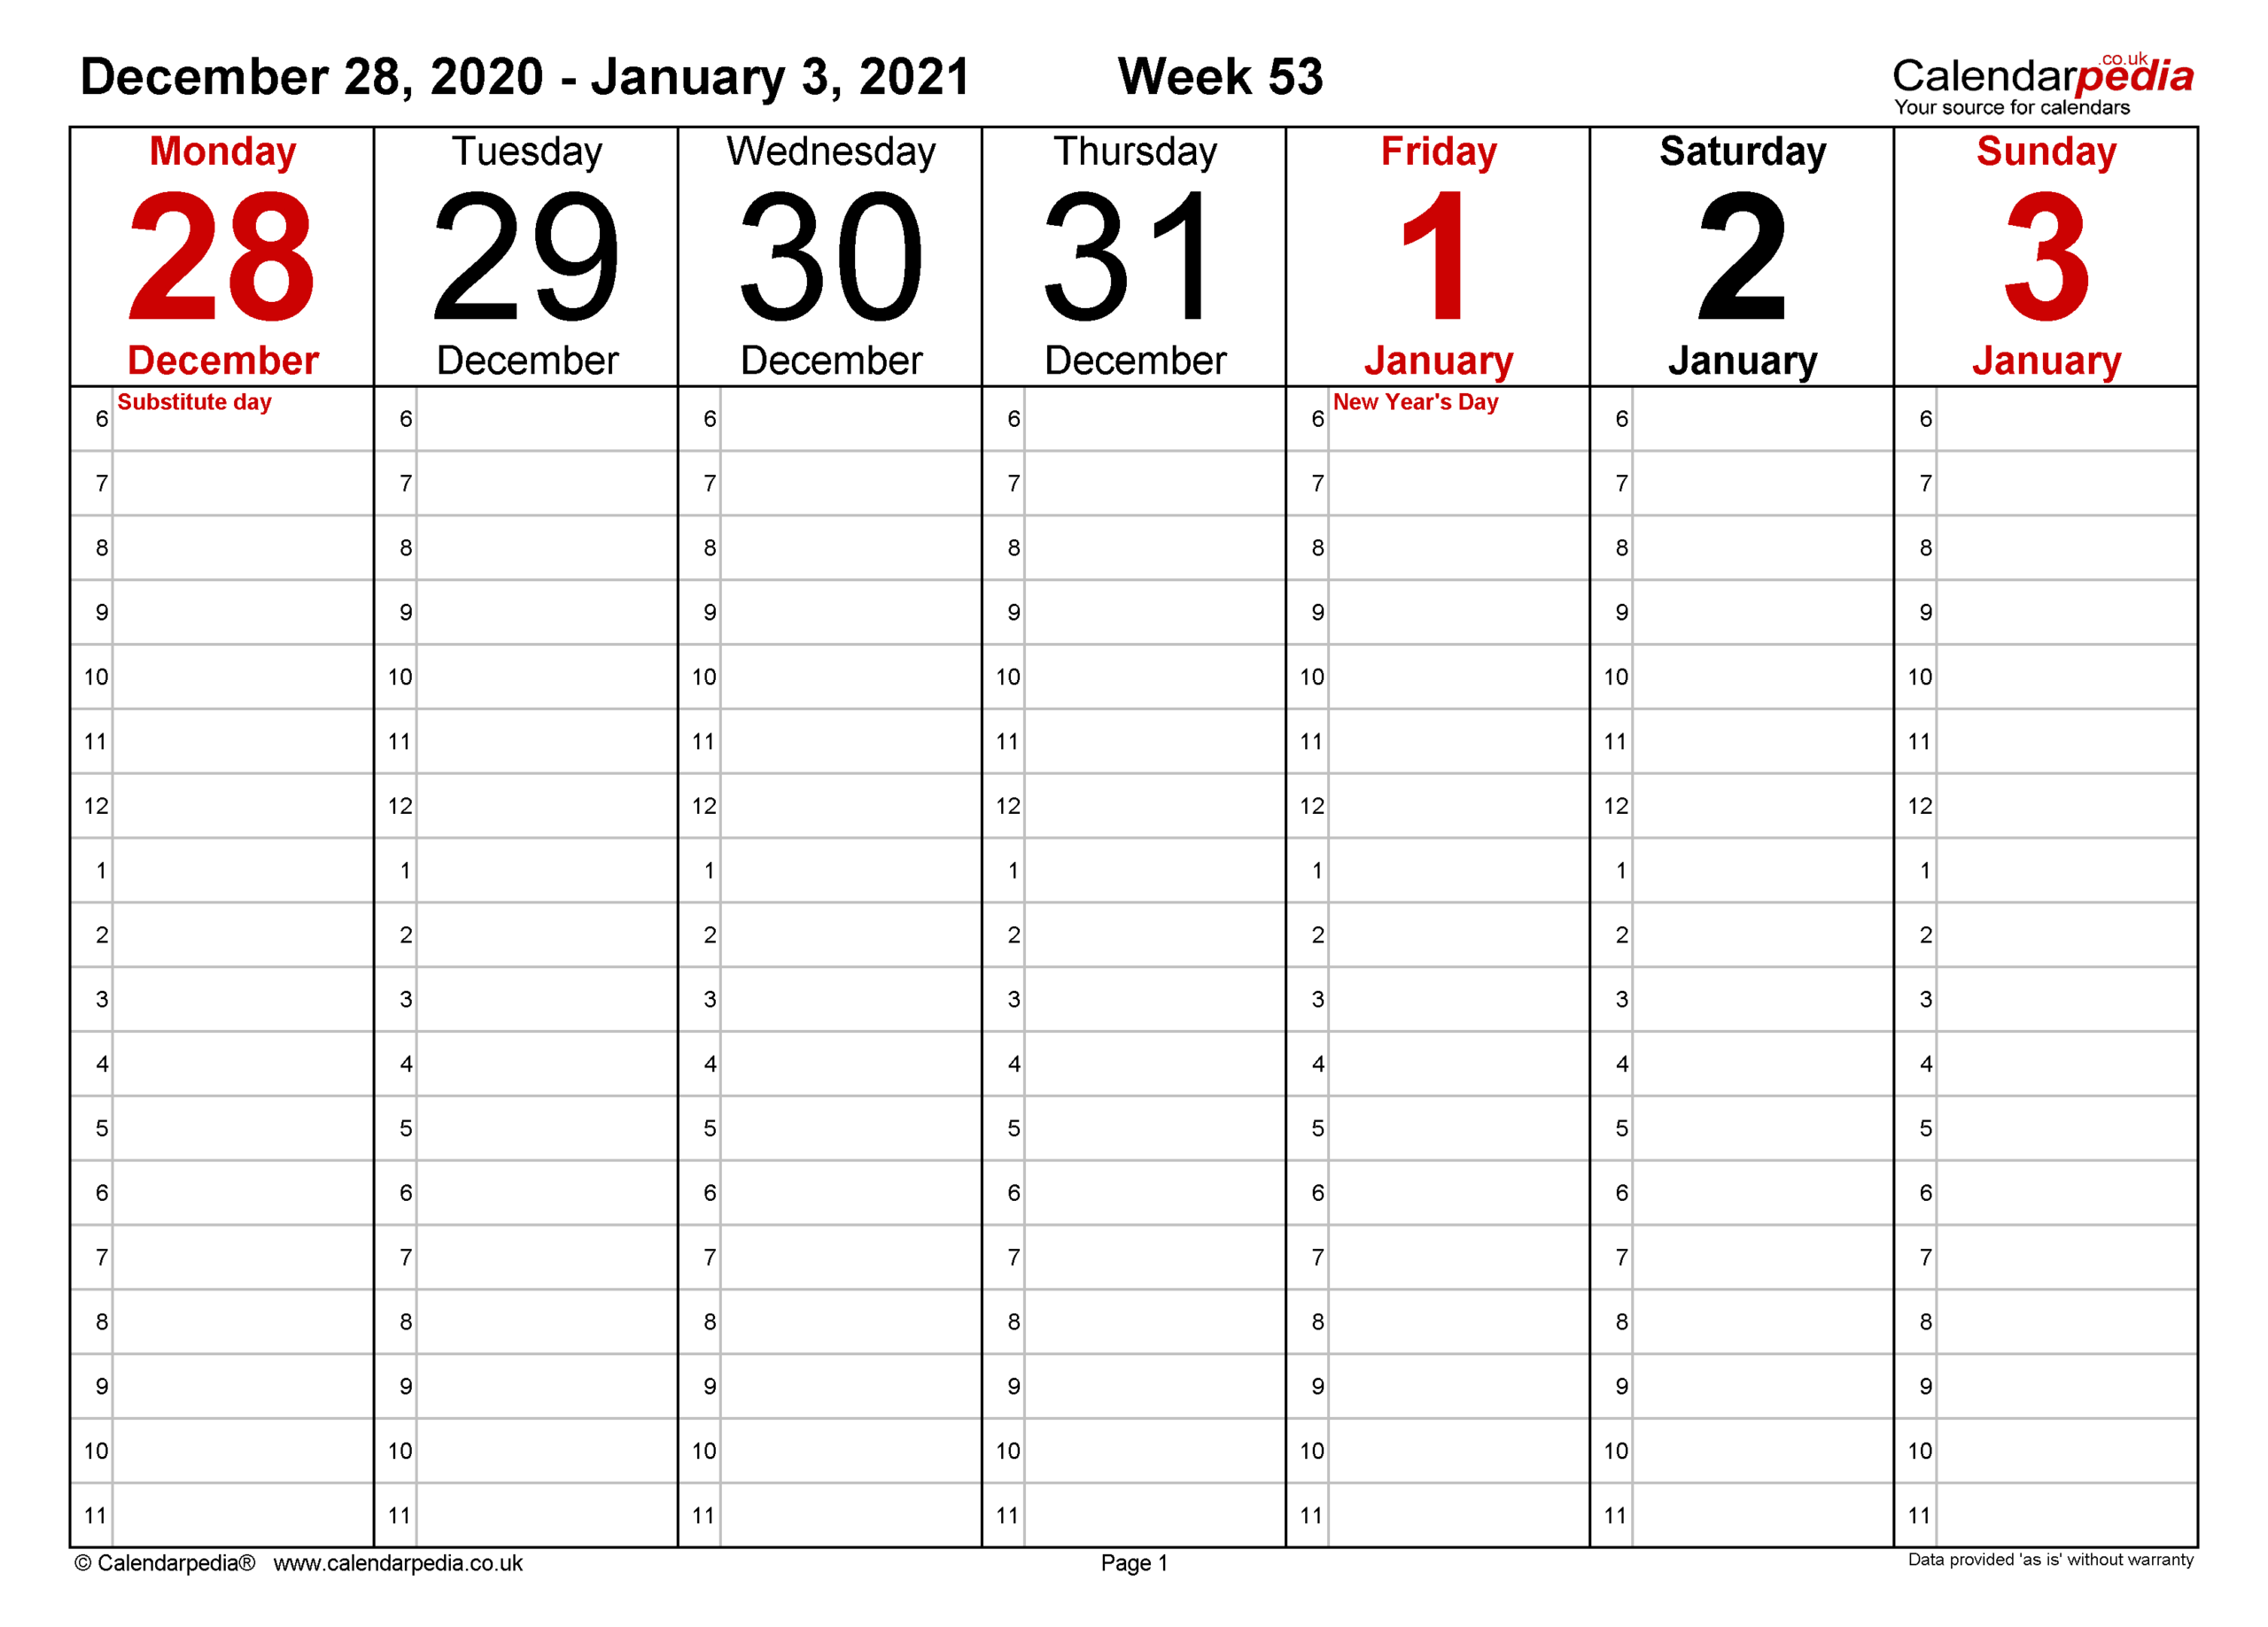 Weekly Calendar 2021 Uk - Free Printable Templates For Pdf-Microsoft Word Calendar Template 2021